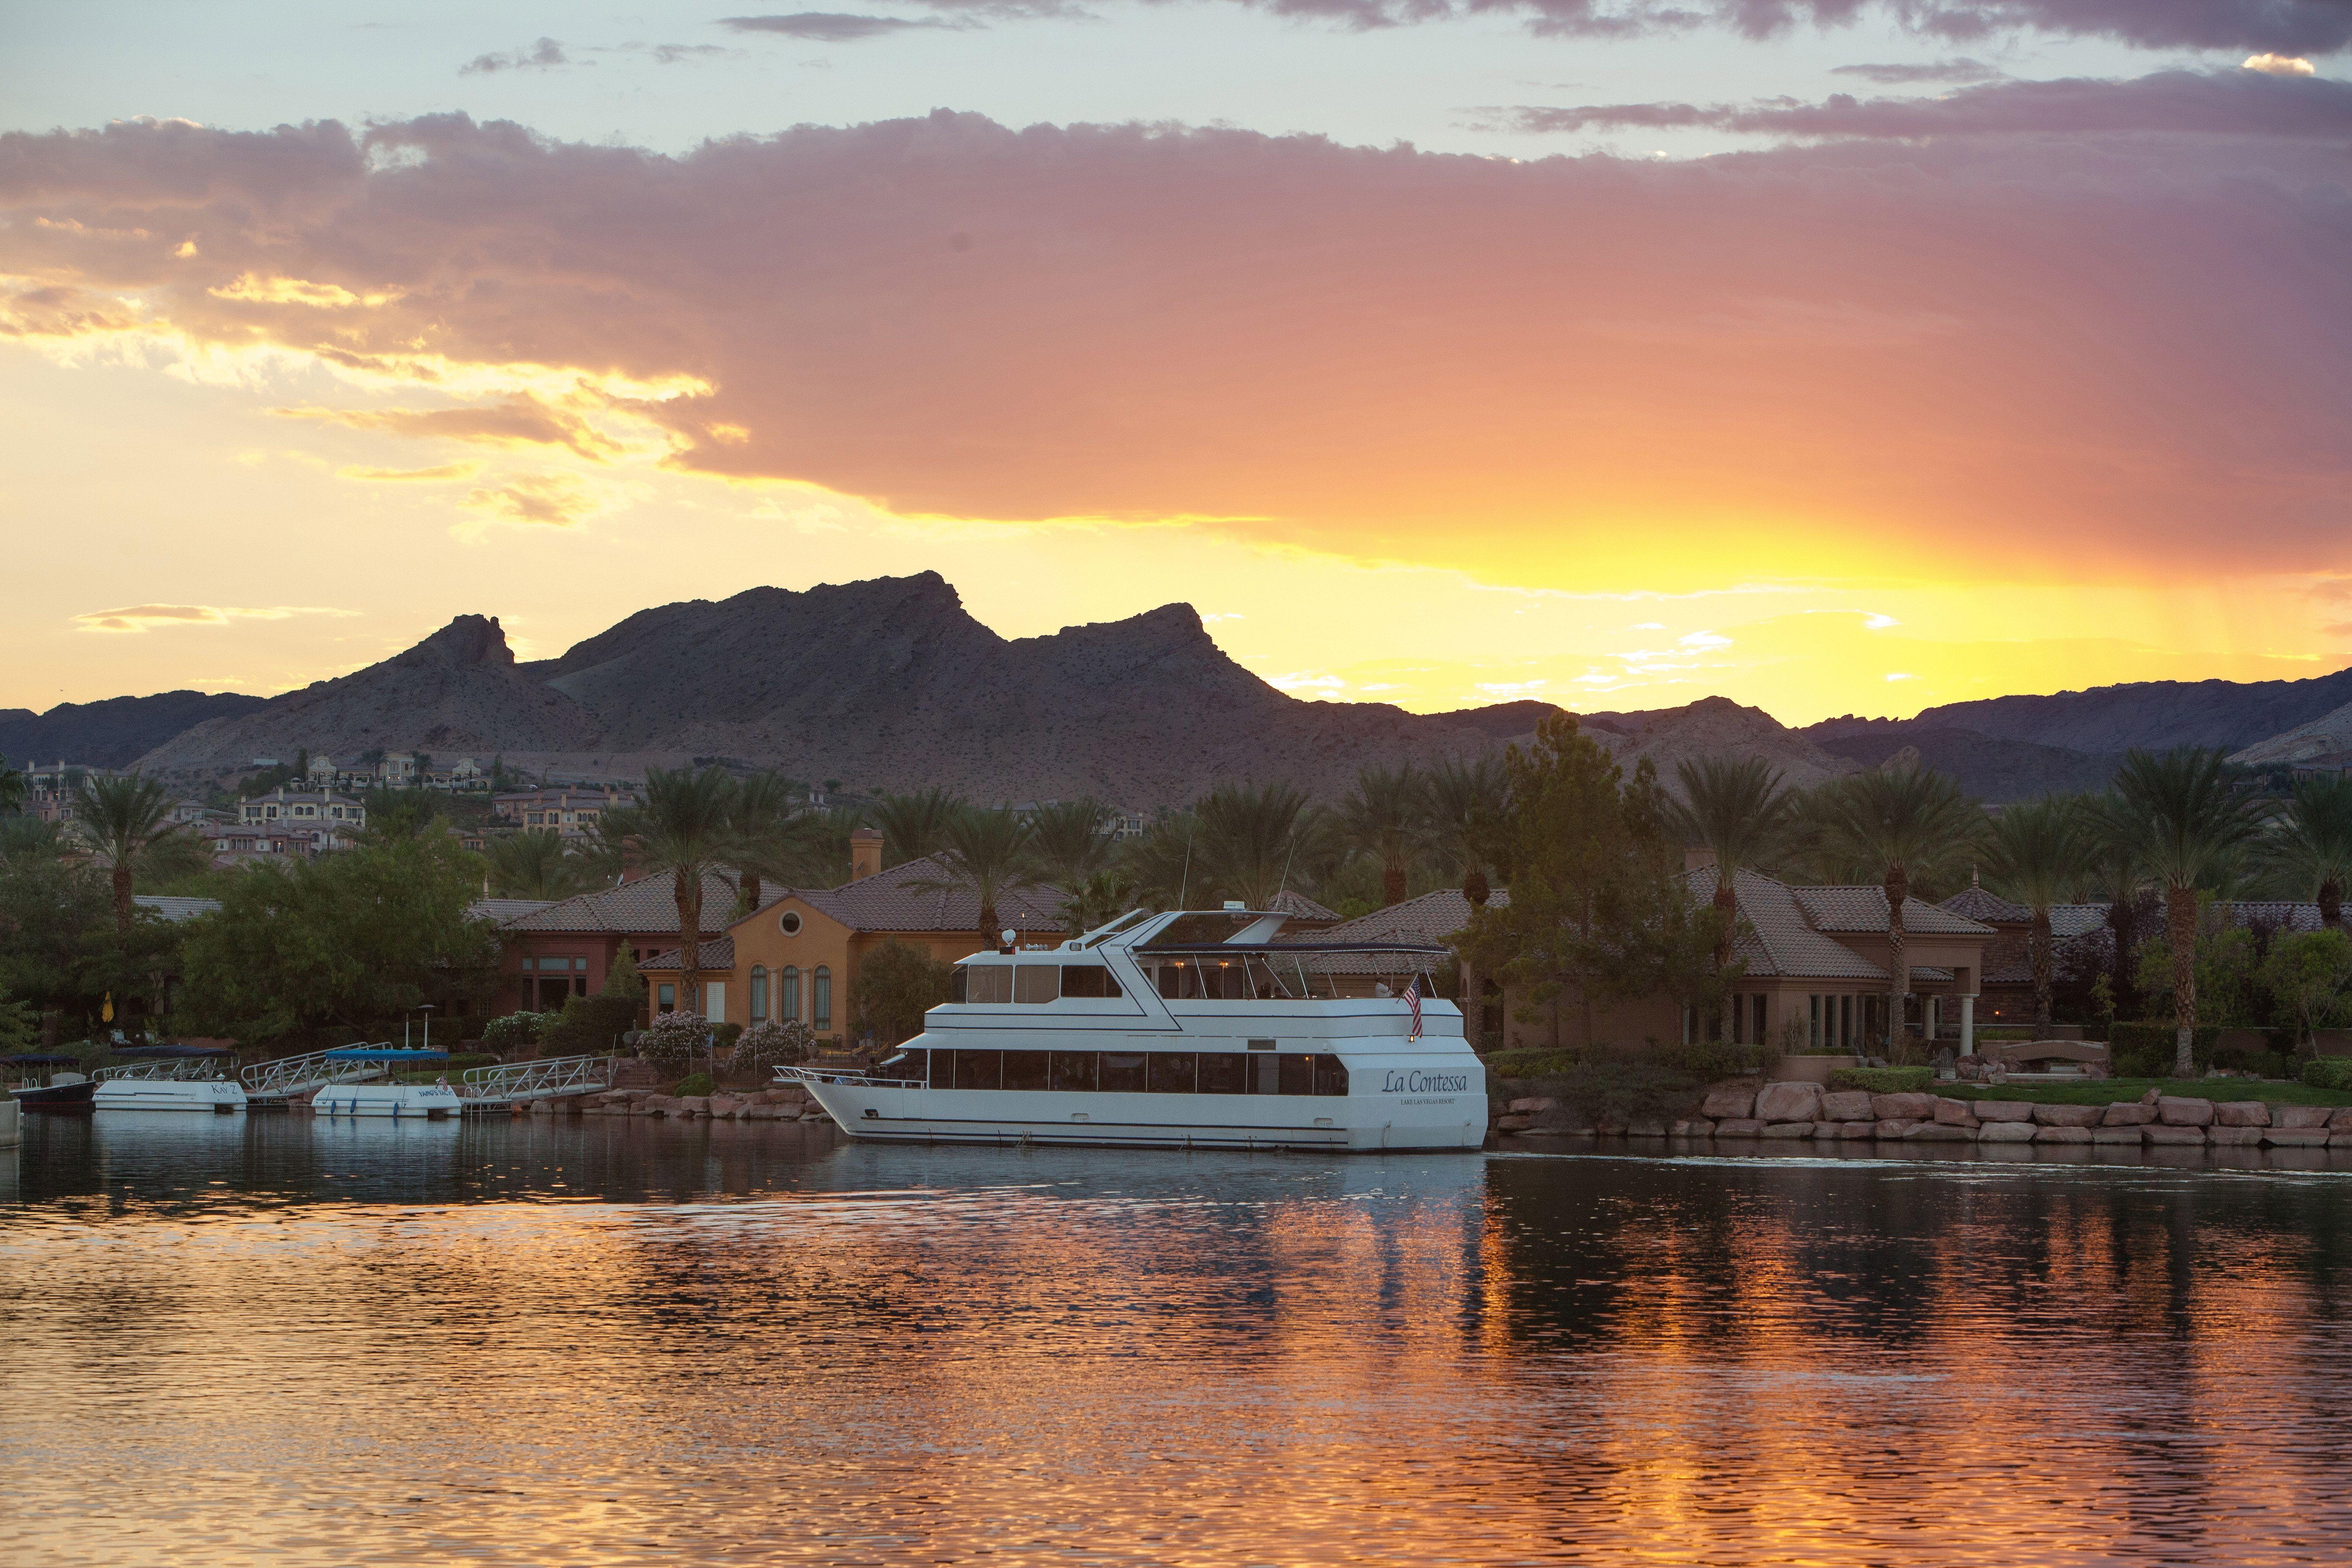 La Contessa Yacht Lake Club At Las Vegas